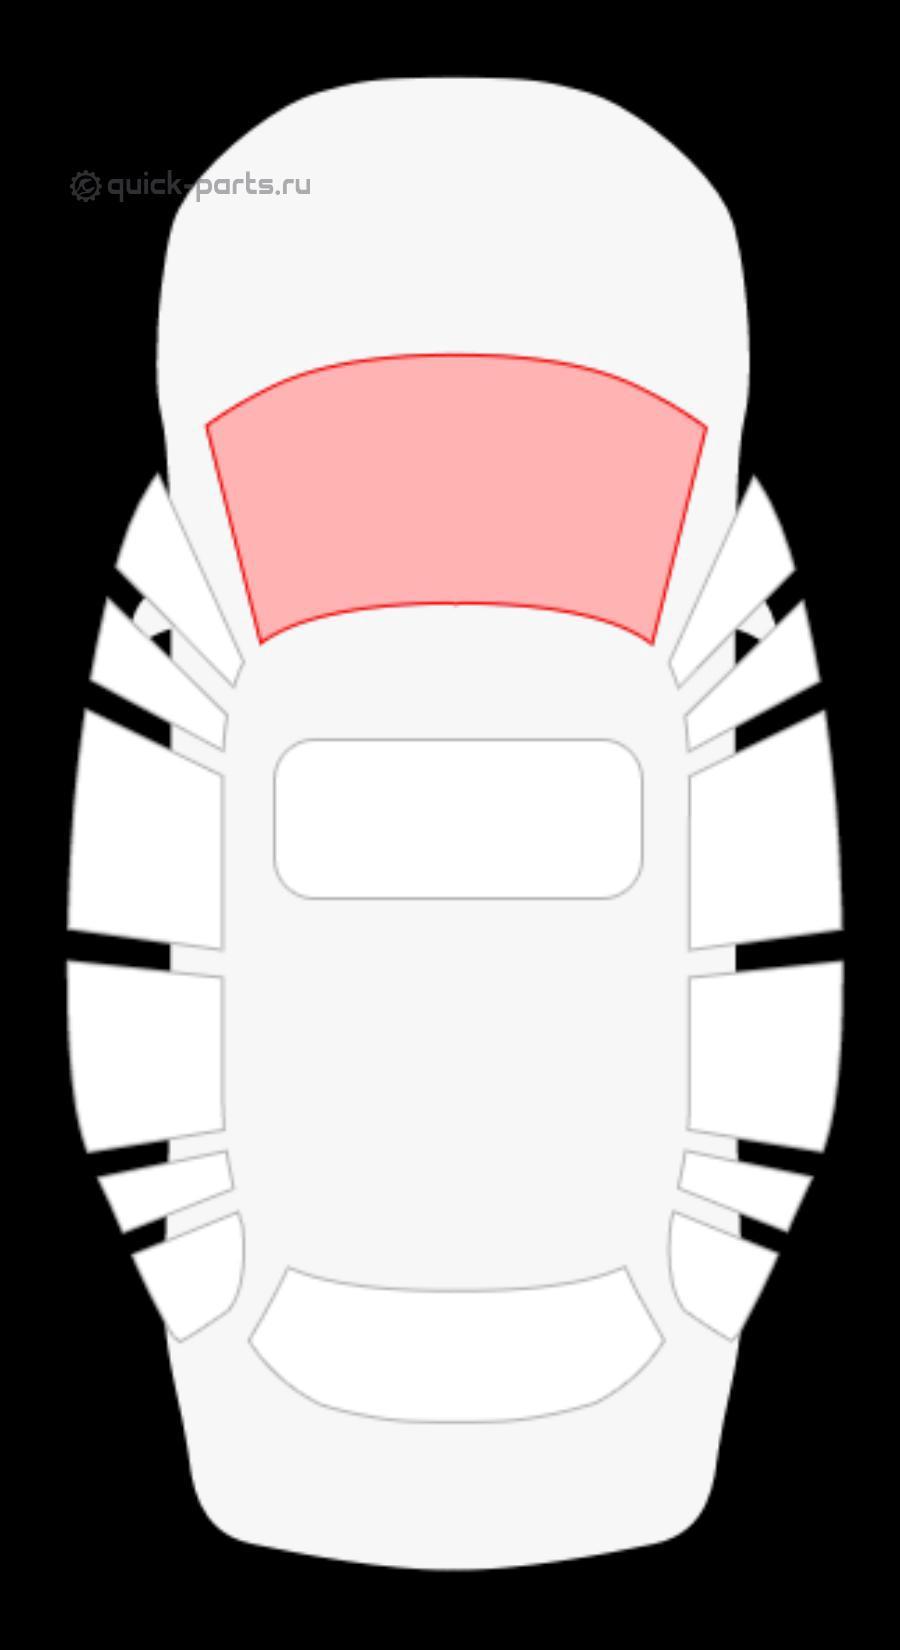 Honda Accord 4D седан / 5D Stw (изменения по шелку)